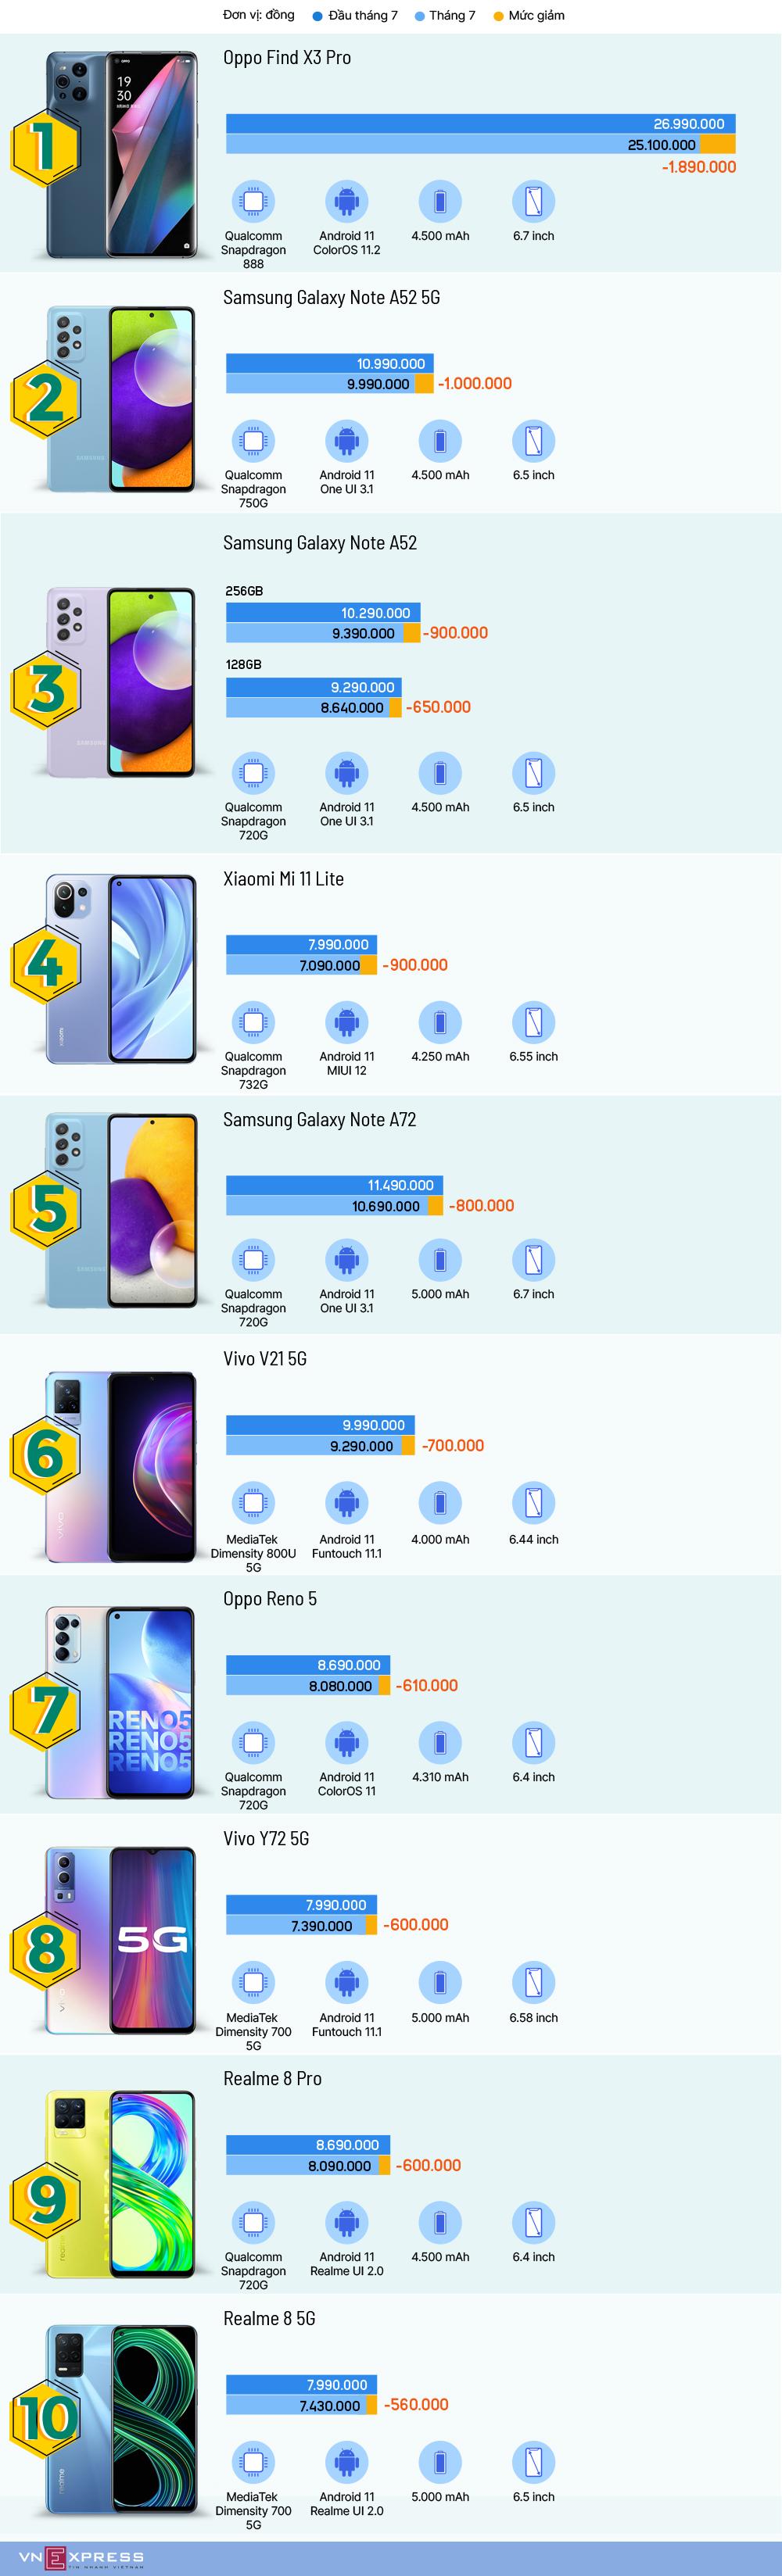 10 smartphone nổi bật vừa giảm giá